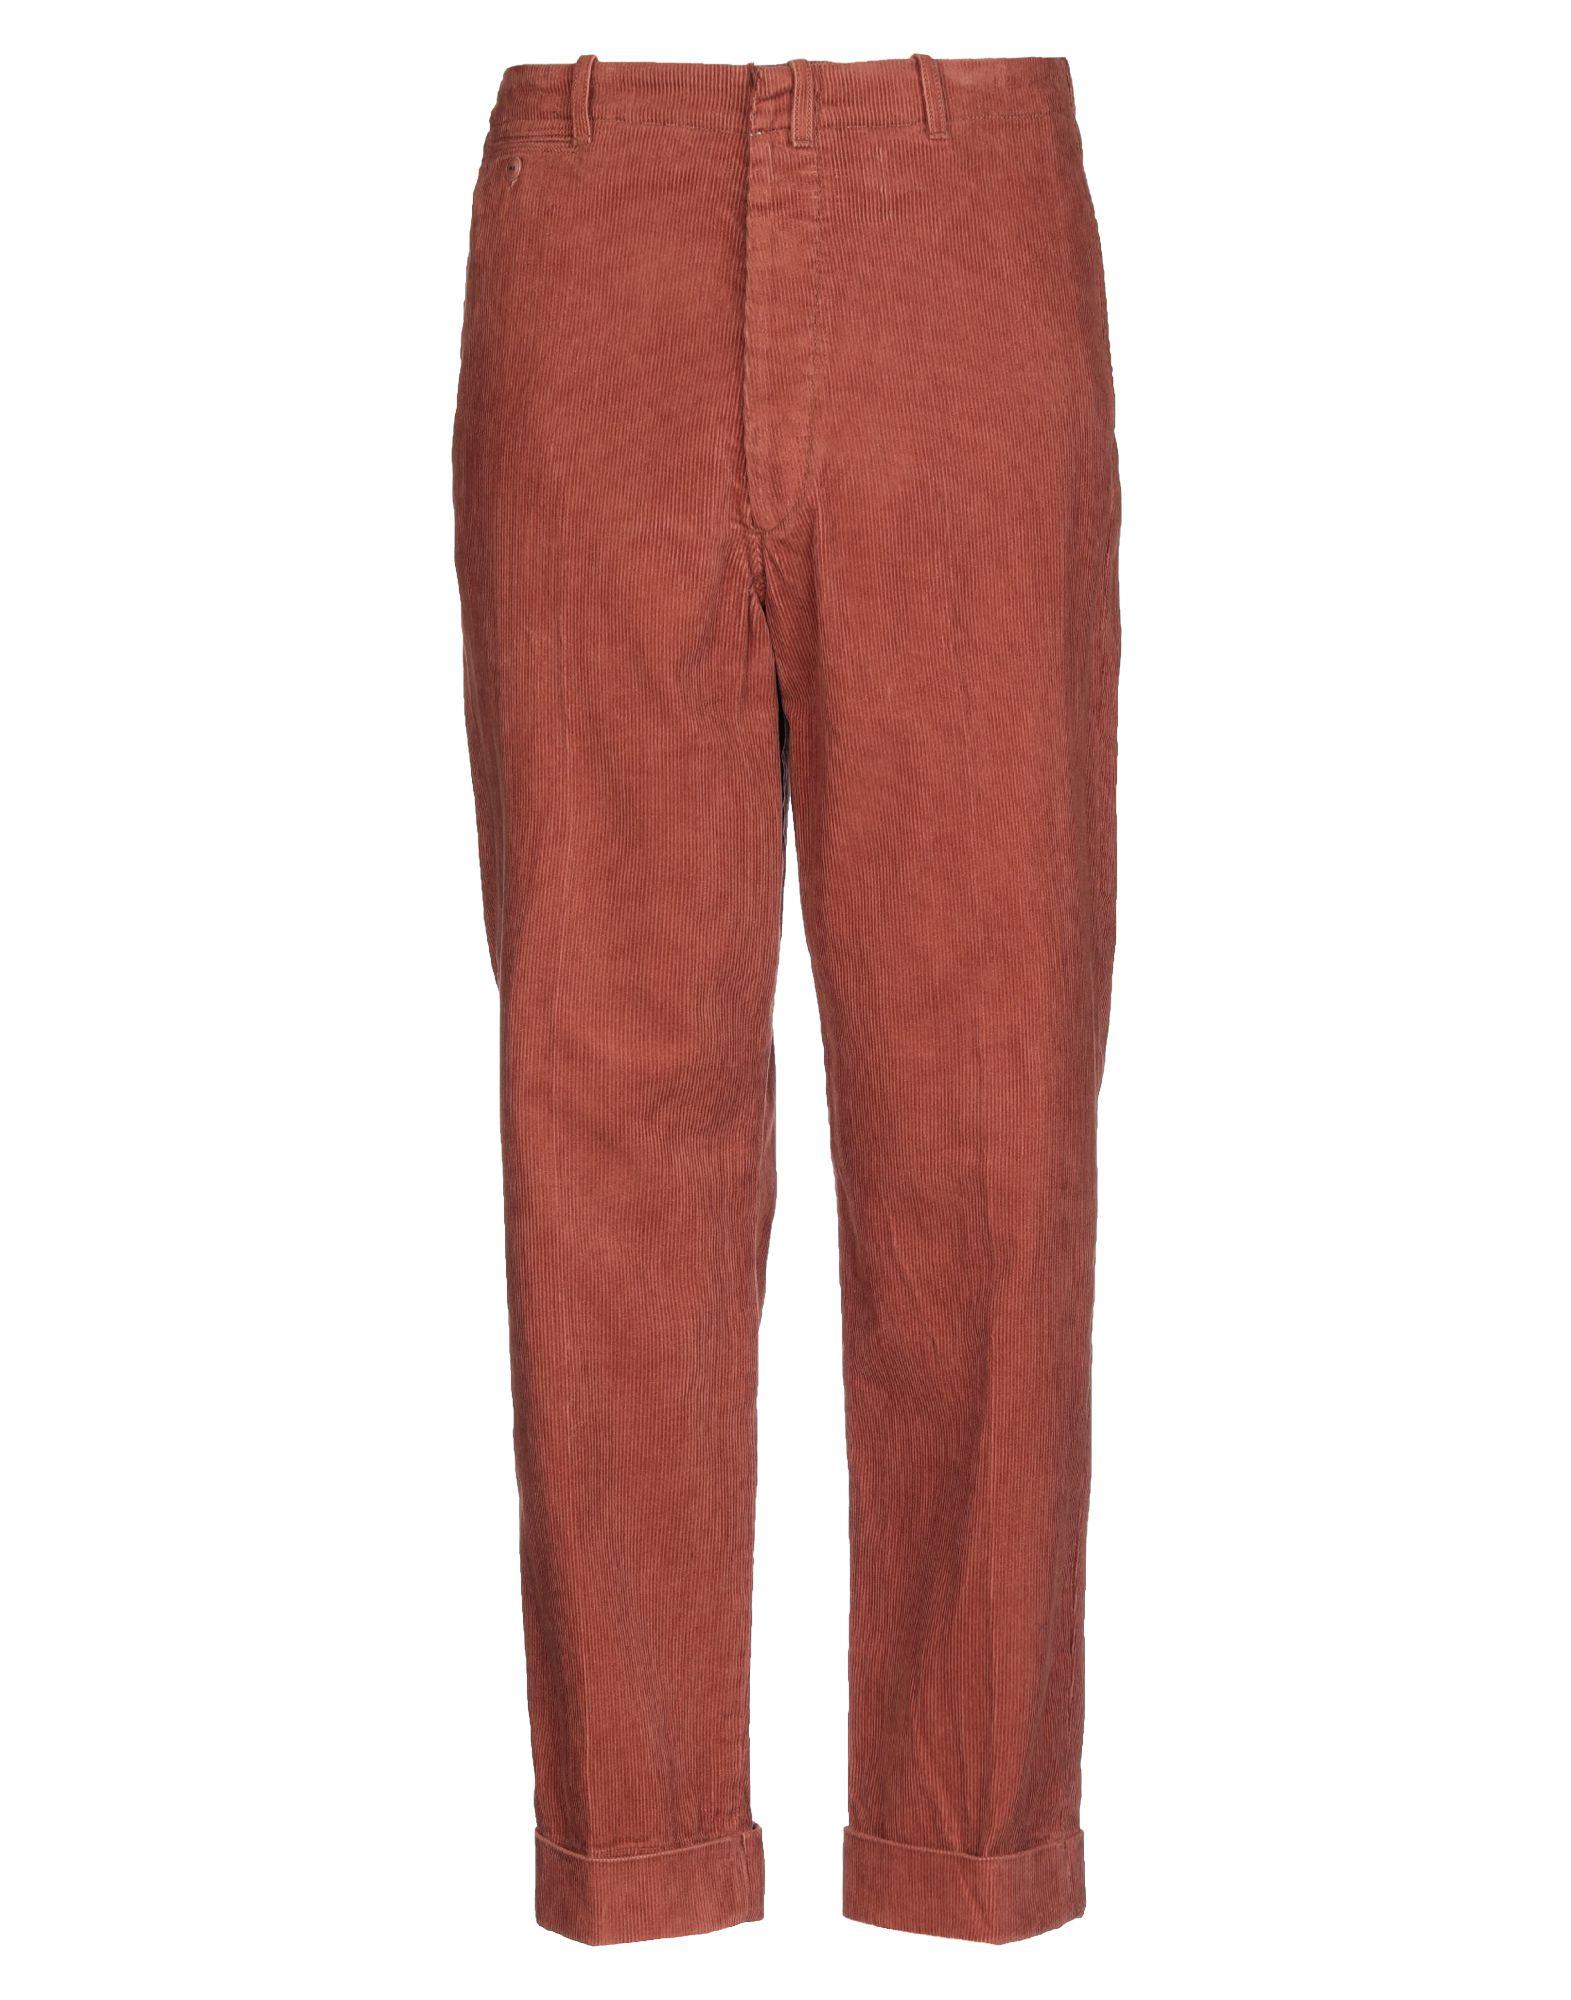 LEVI'S VINTAGE CLOTHING Повседневные брюки v2® living clothing повседневные брюки